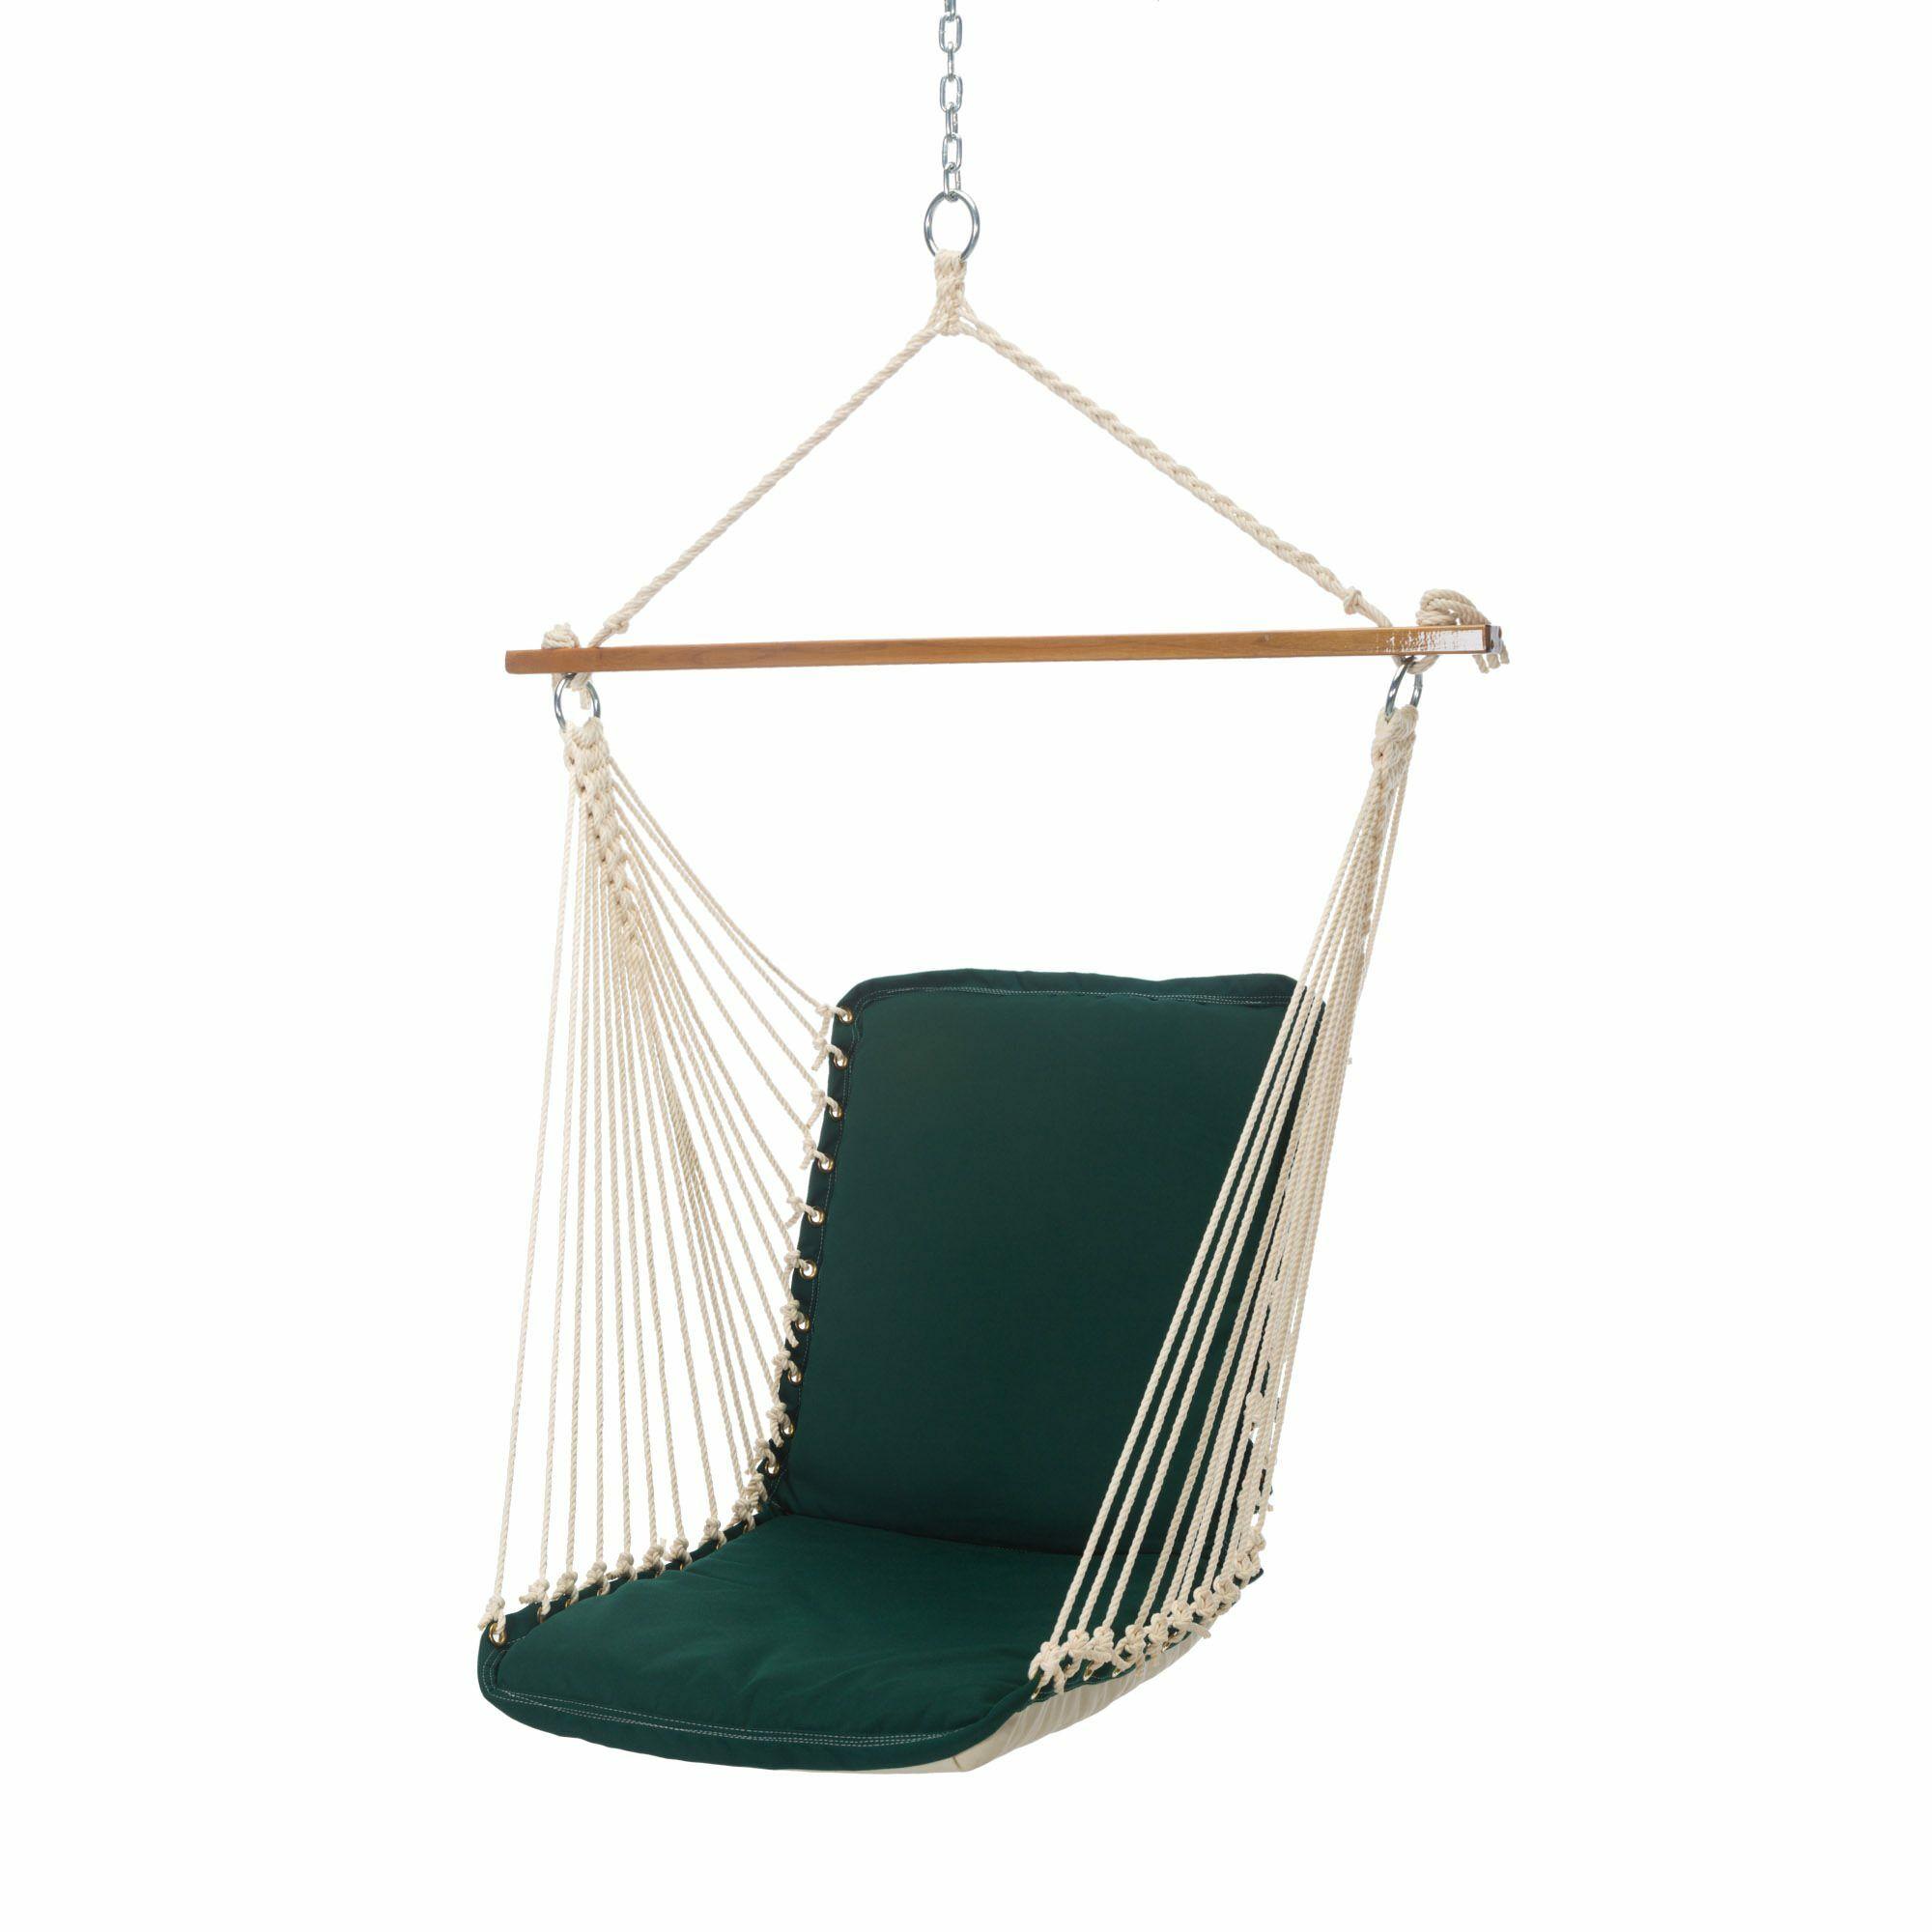 Deblois Chair Hammock